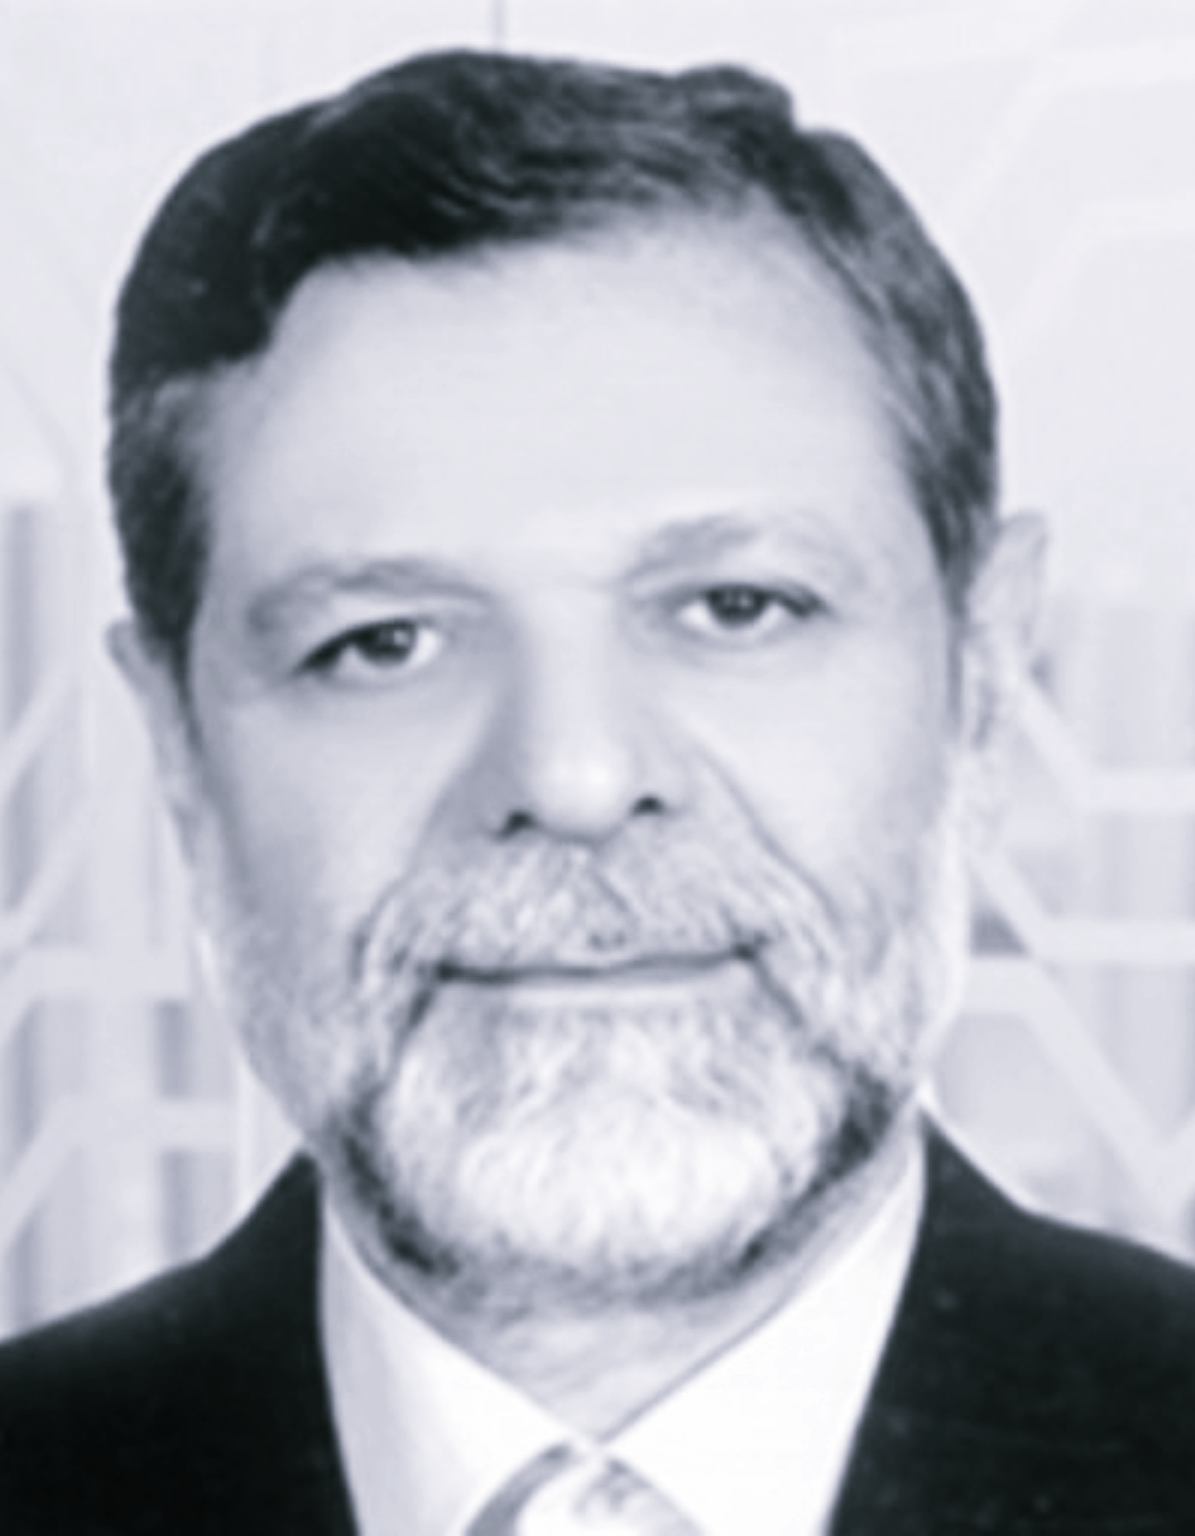 Sayed Kazem Sadr